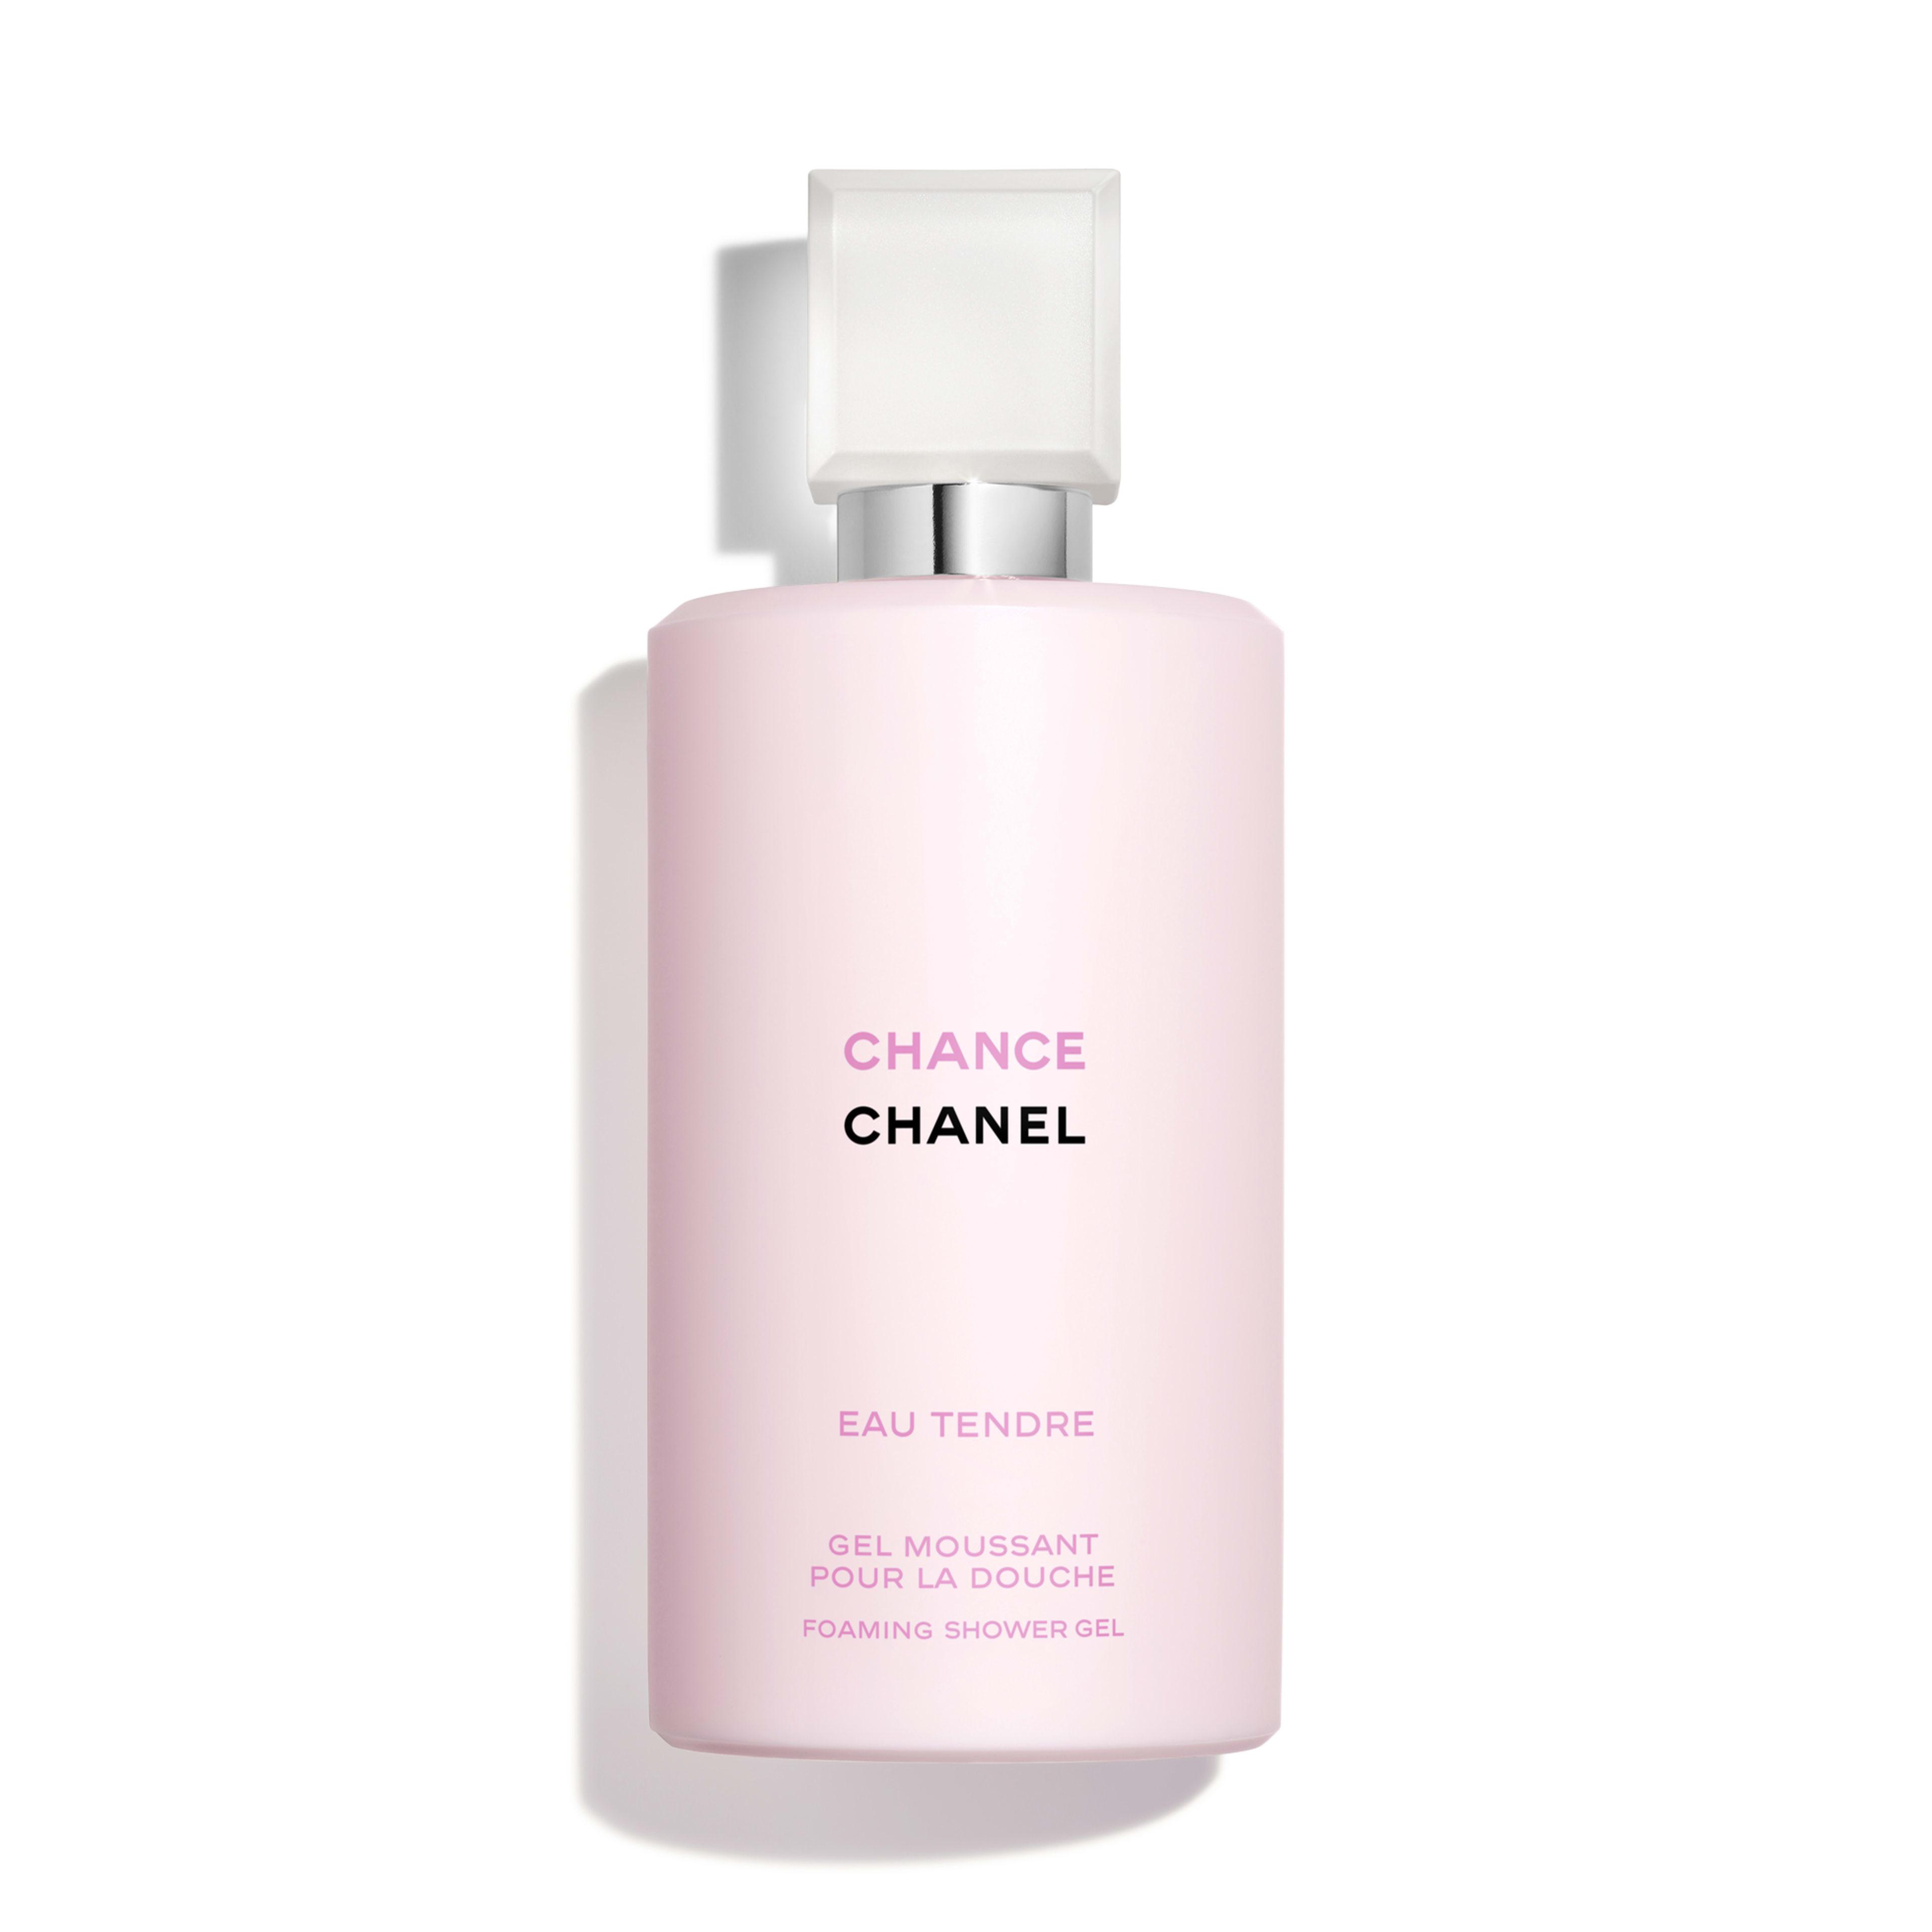 CHANCE EAU TENDRE - fragrance - 200ml - Widok domyślny